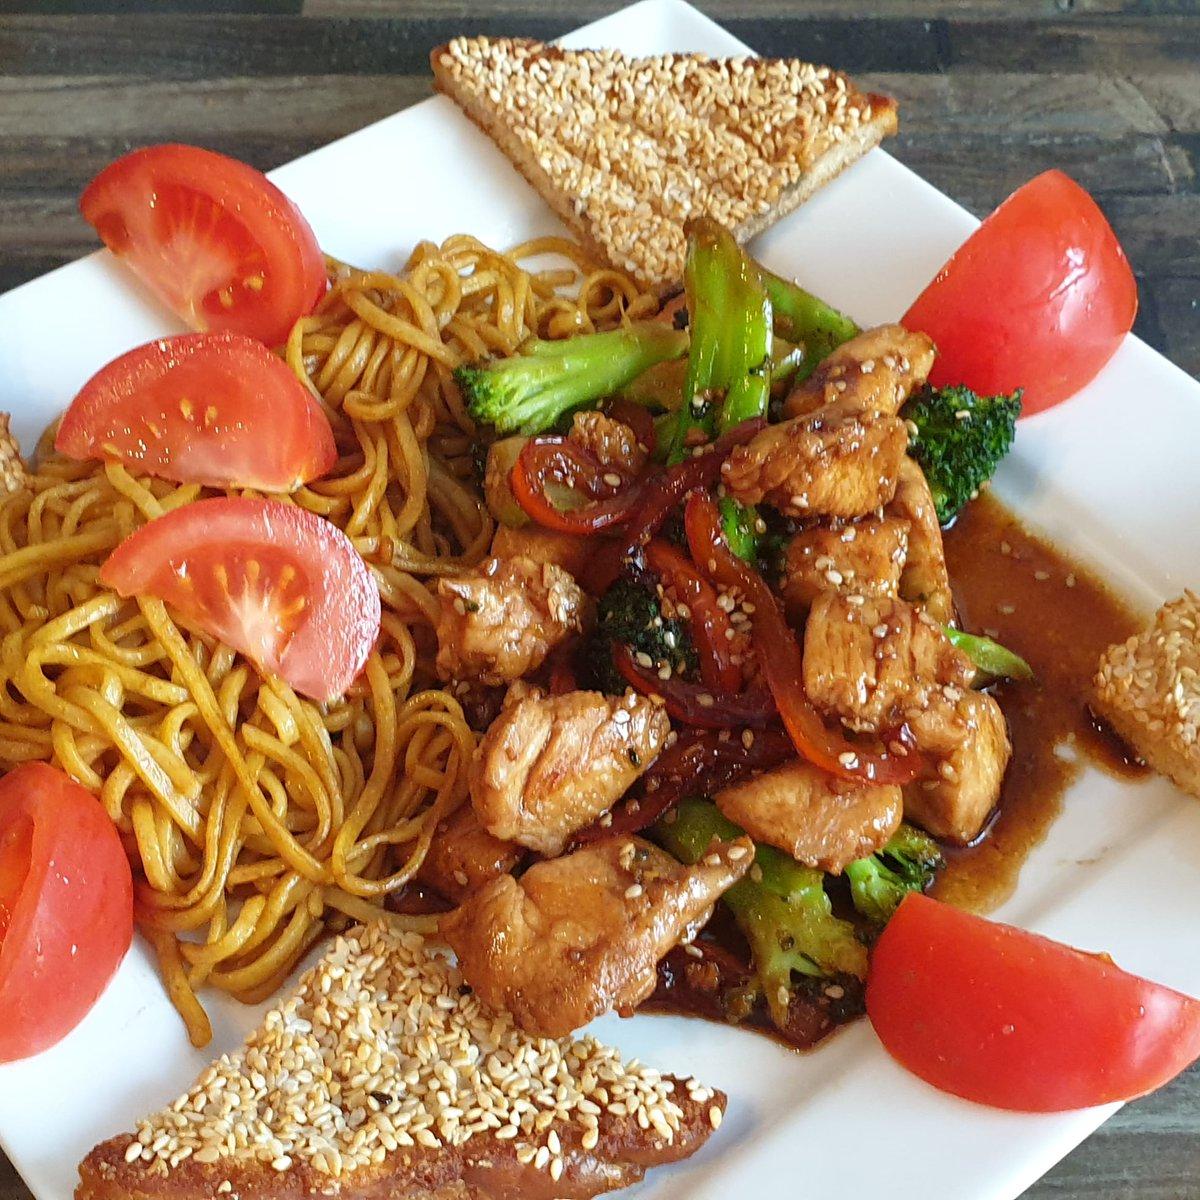 An old fsv tonight, sesame chicken and broccoli  https://t.co/YaJxMrcF79 #twochubbycubs #sesameseed #slimmingworld https://t.co/9rK7SOK5ff